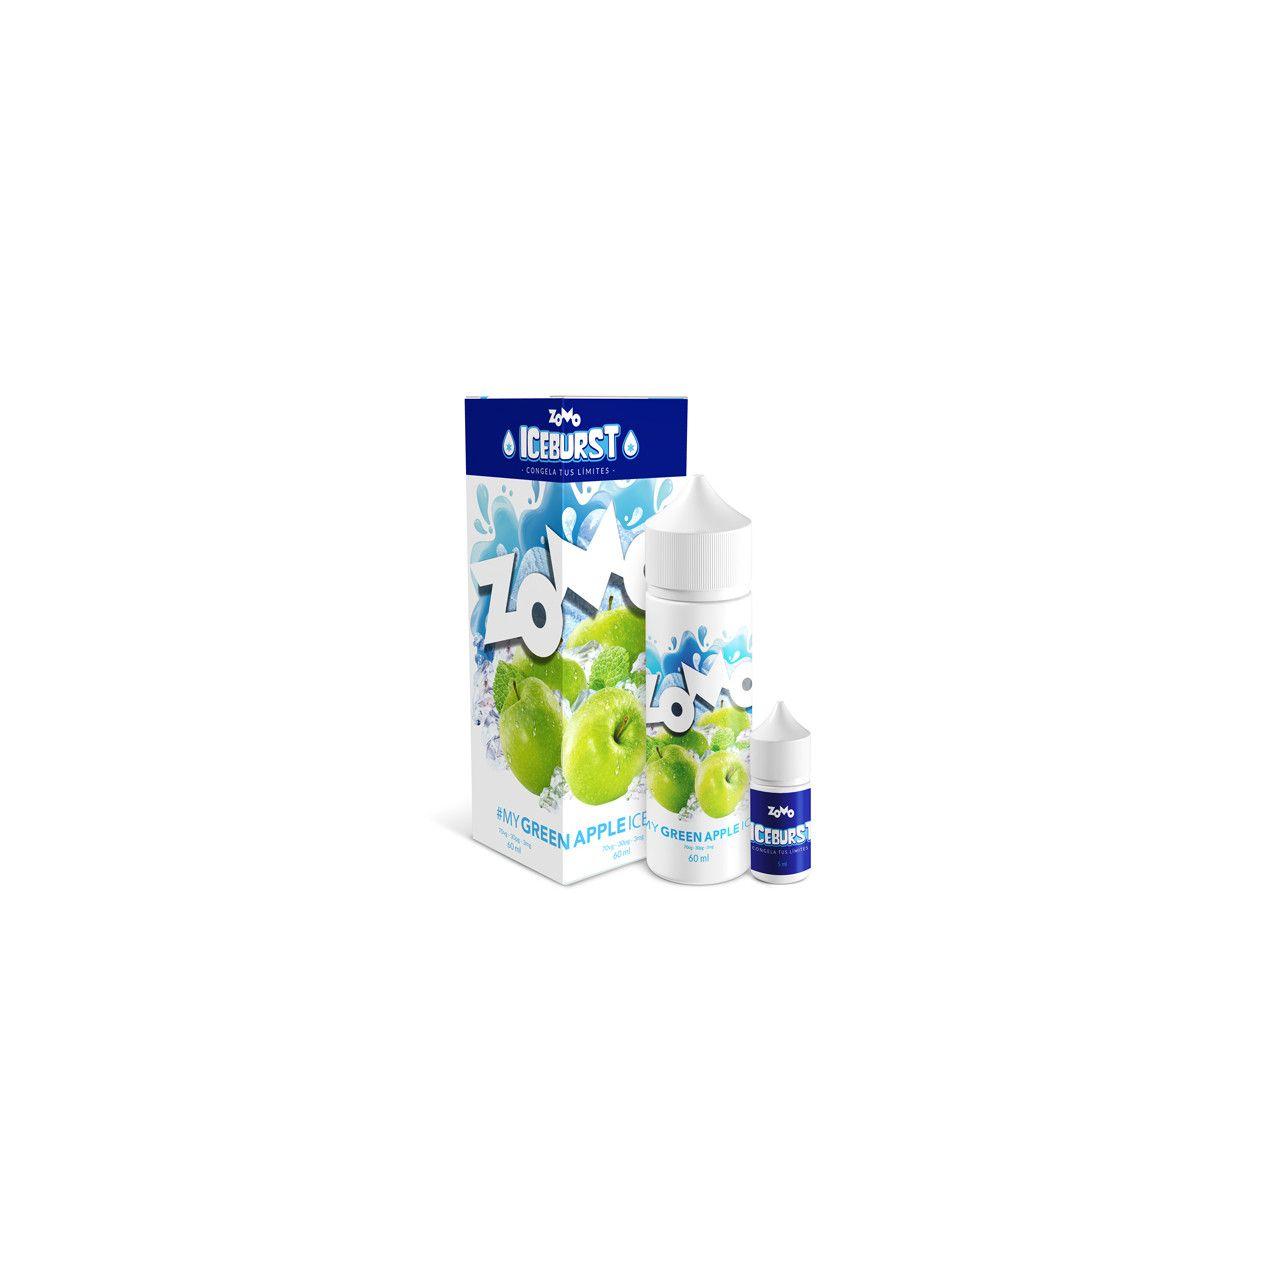 Zomo Vape - Green Apple - Iceburst - Juice Zomo Vape - 1